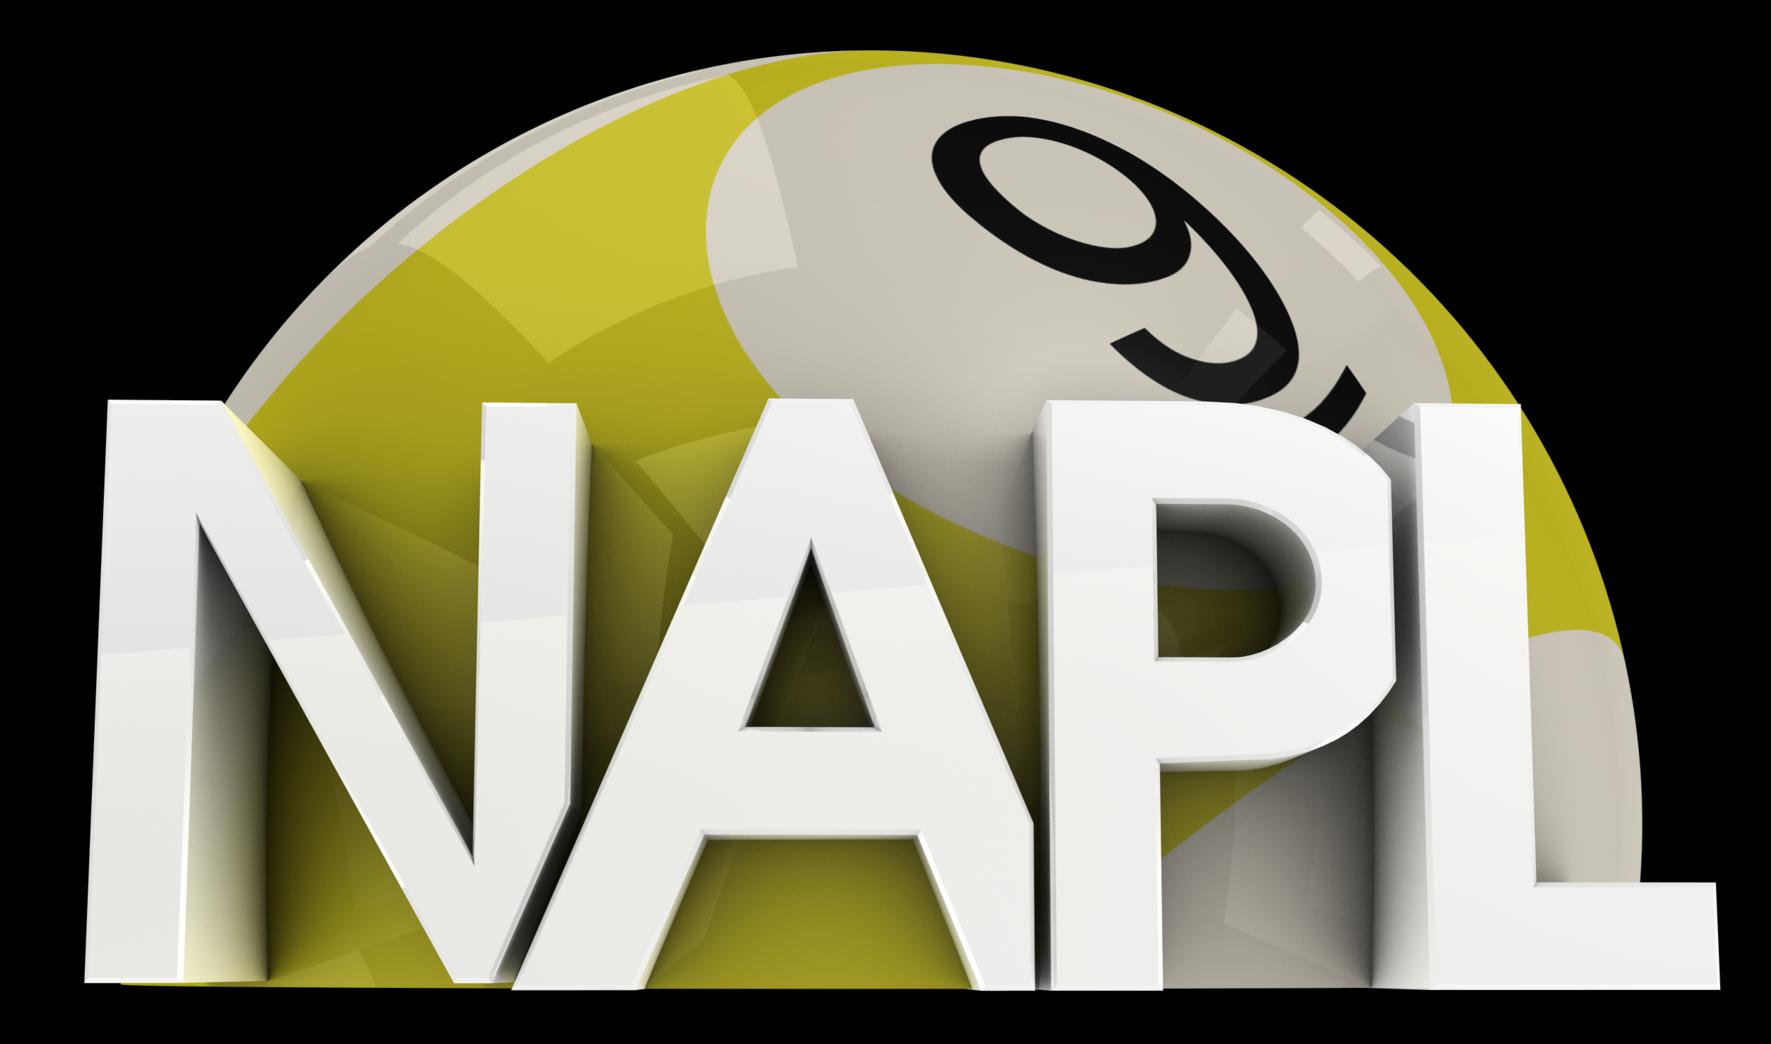 NAPL_9.png